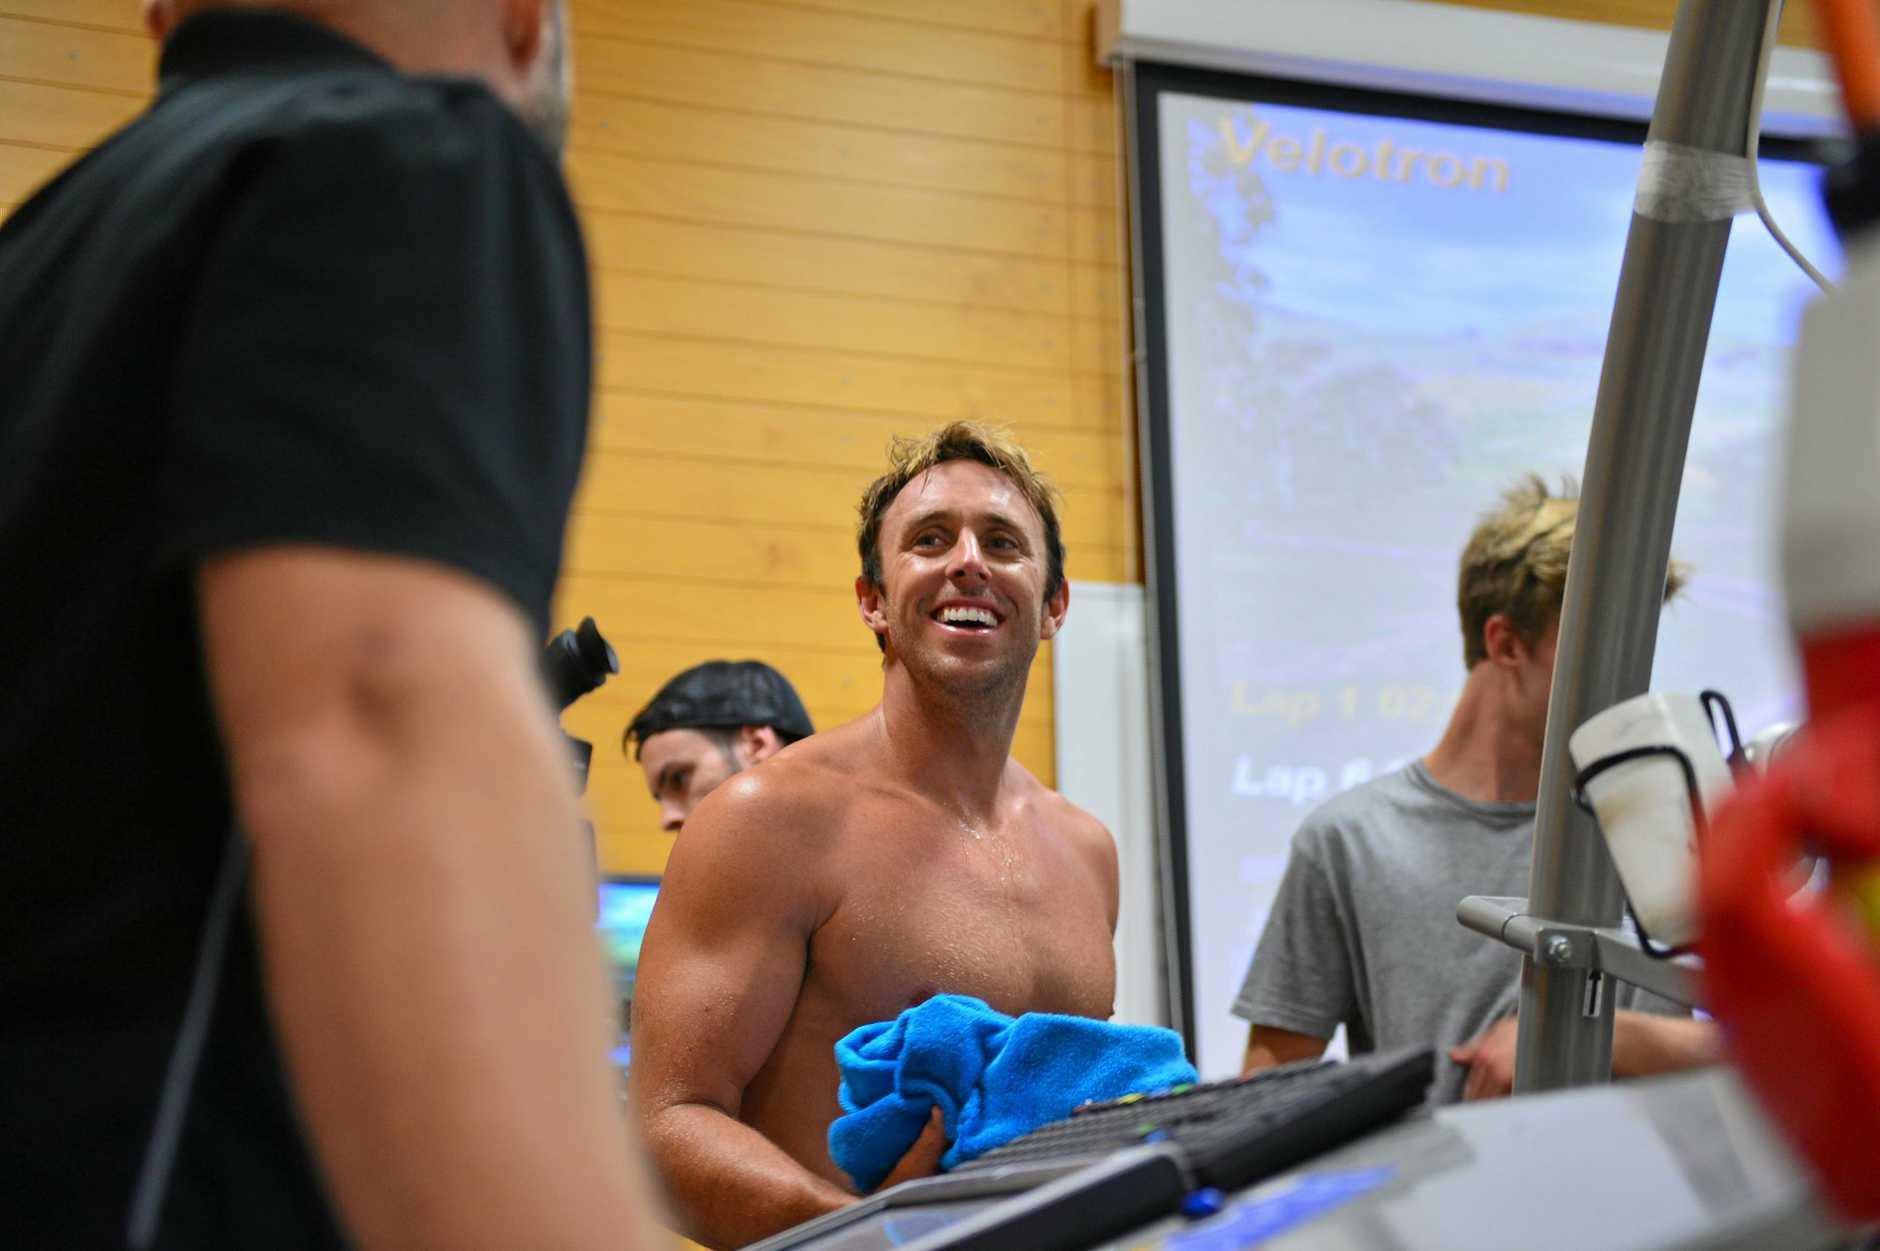 Mark Visser is put through a gruelling fitness test at Sunshine Coast University under the watchful eye of  Lab technician Stephen Bishop.  Photo: John McCutcheon / Sunshine Coast Daily